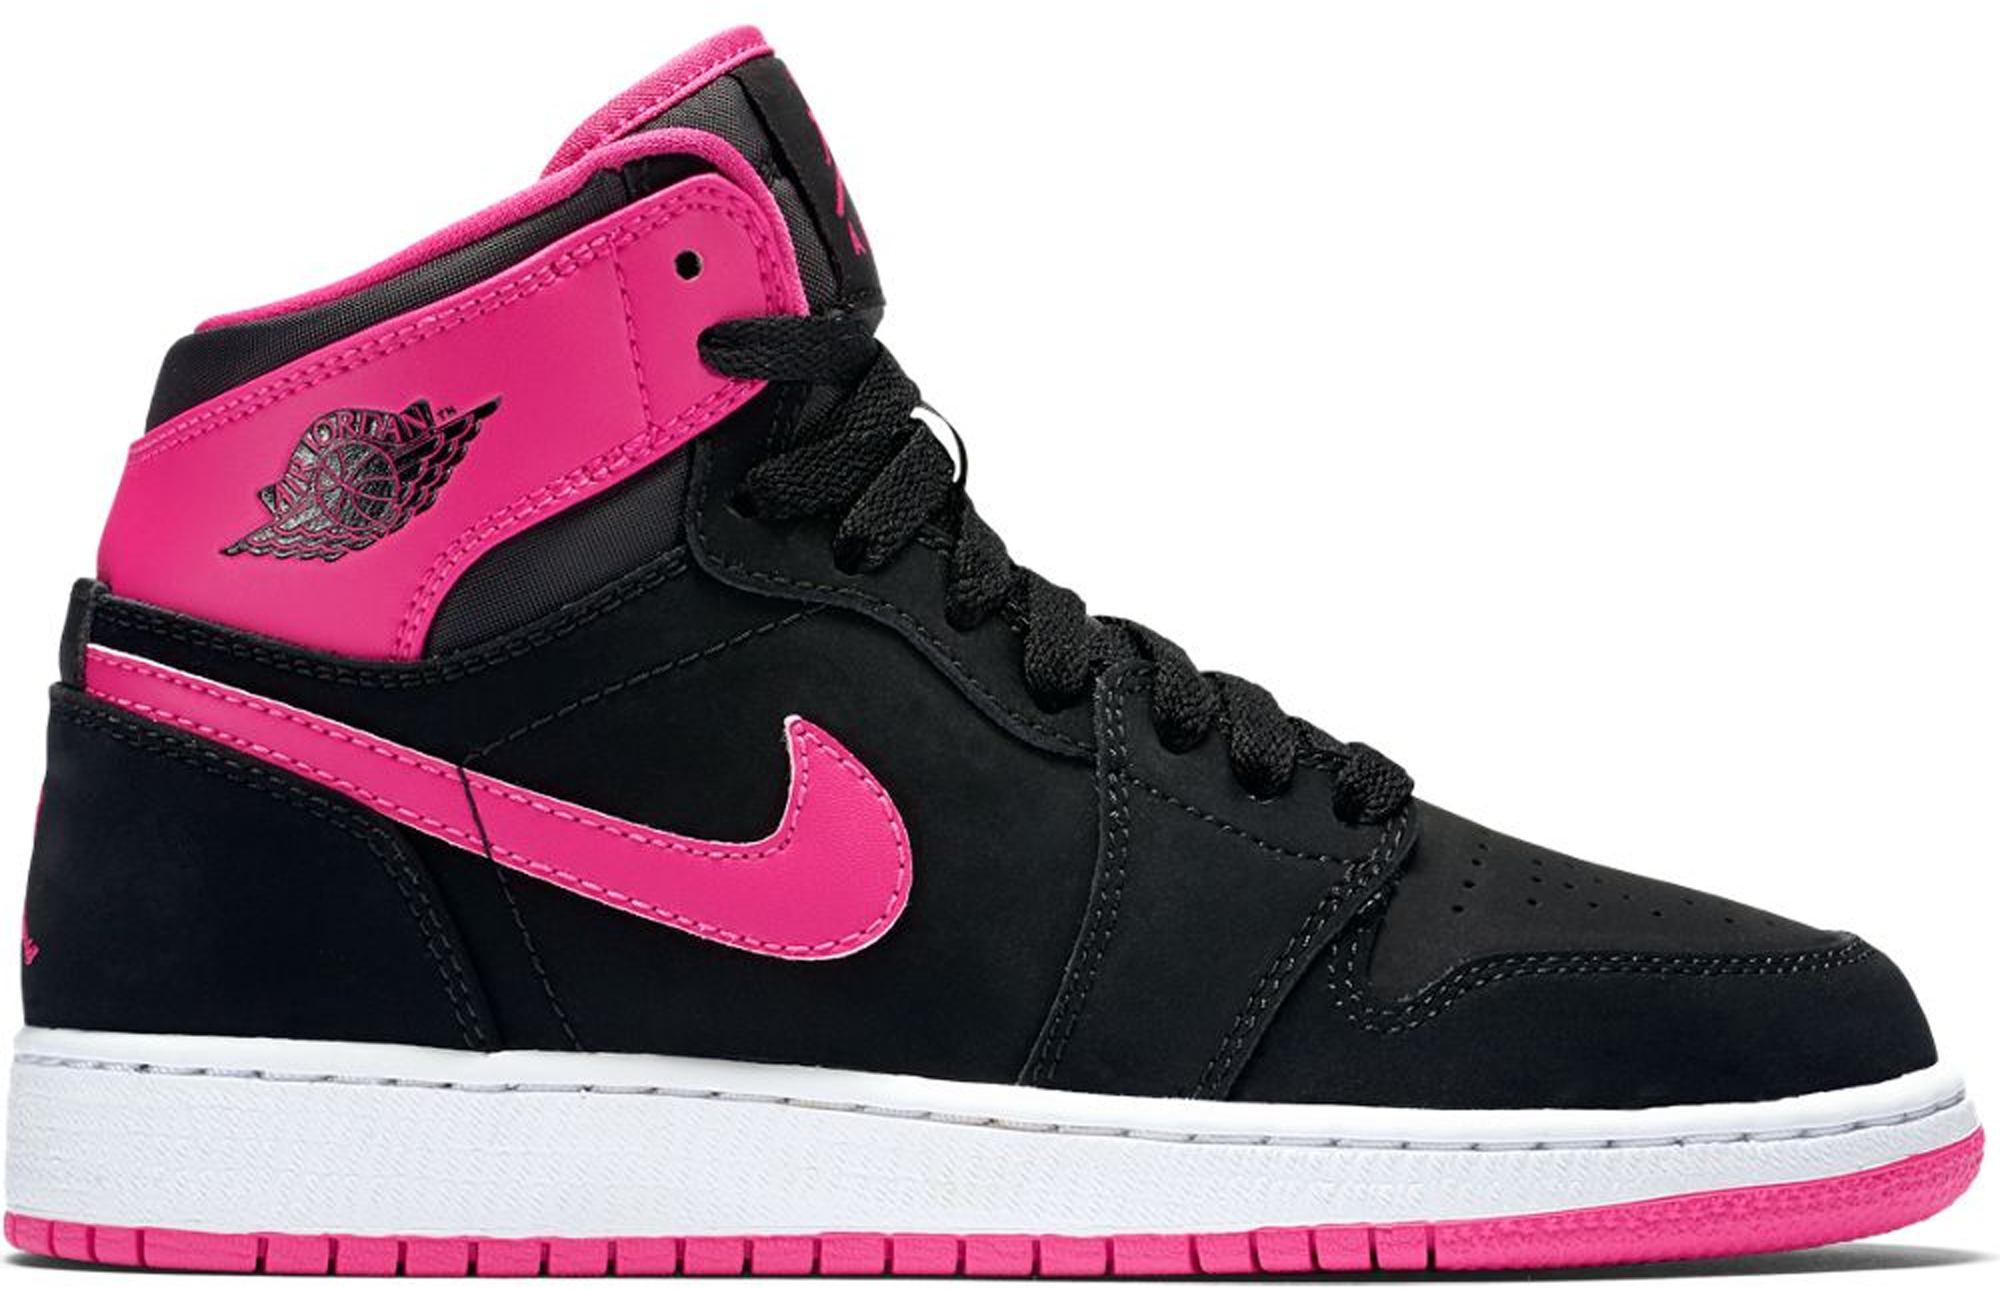 Jordan 1 Retro High Black Vivid Pink